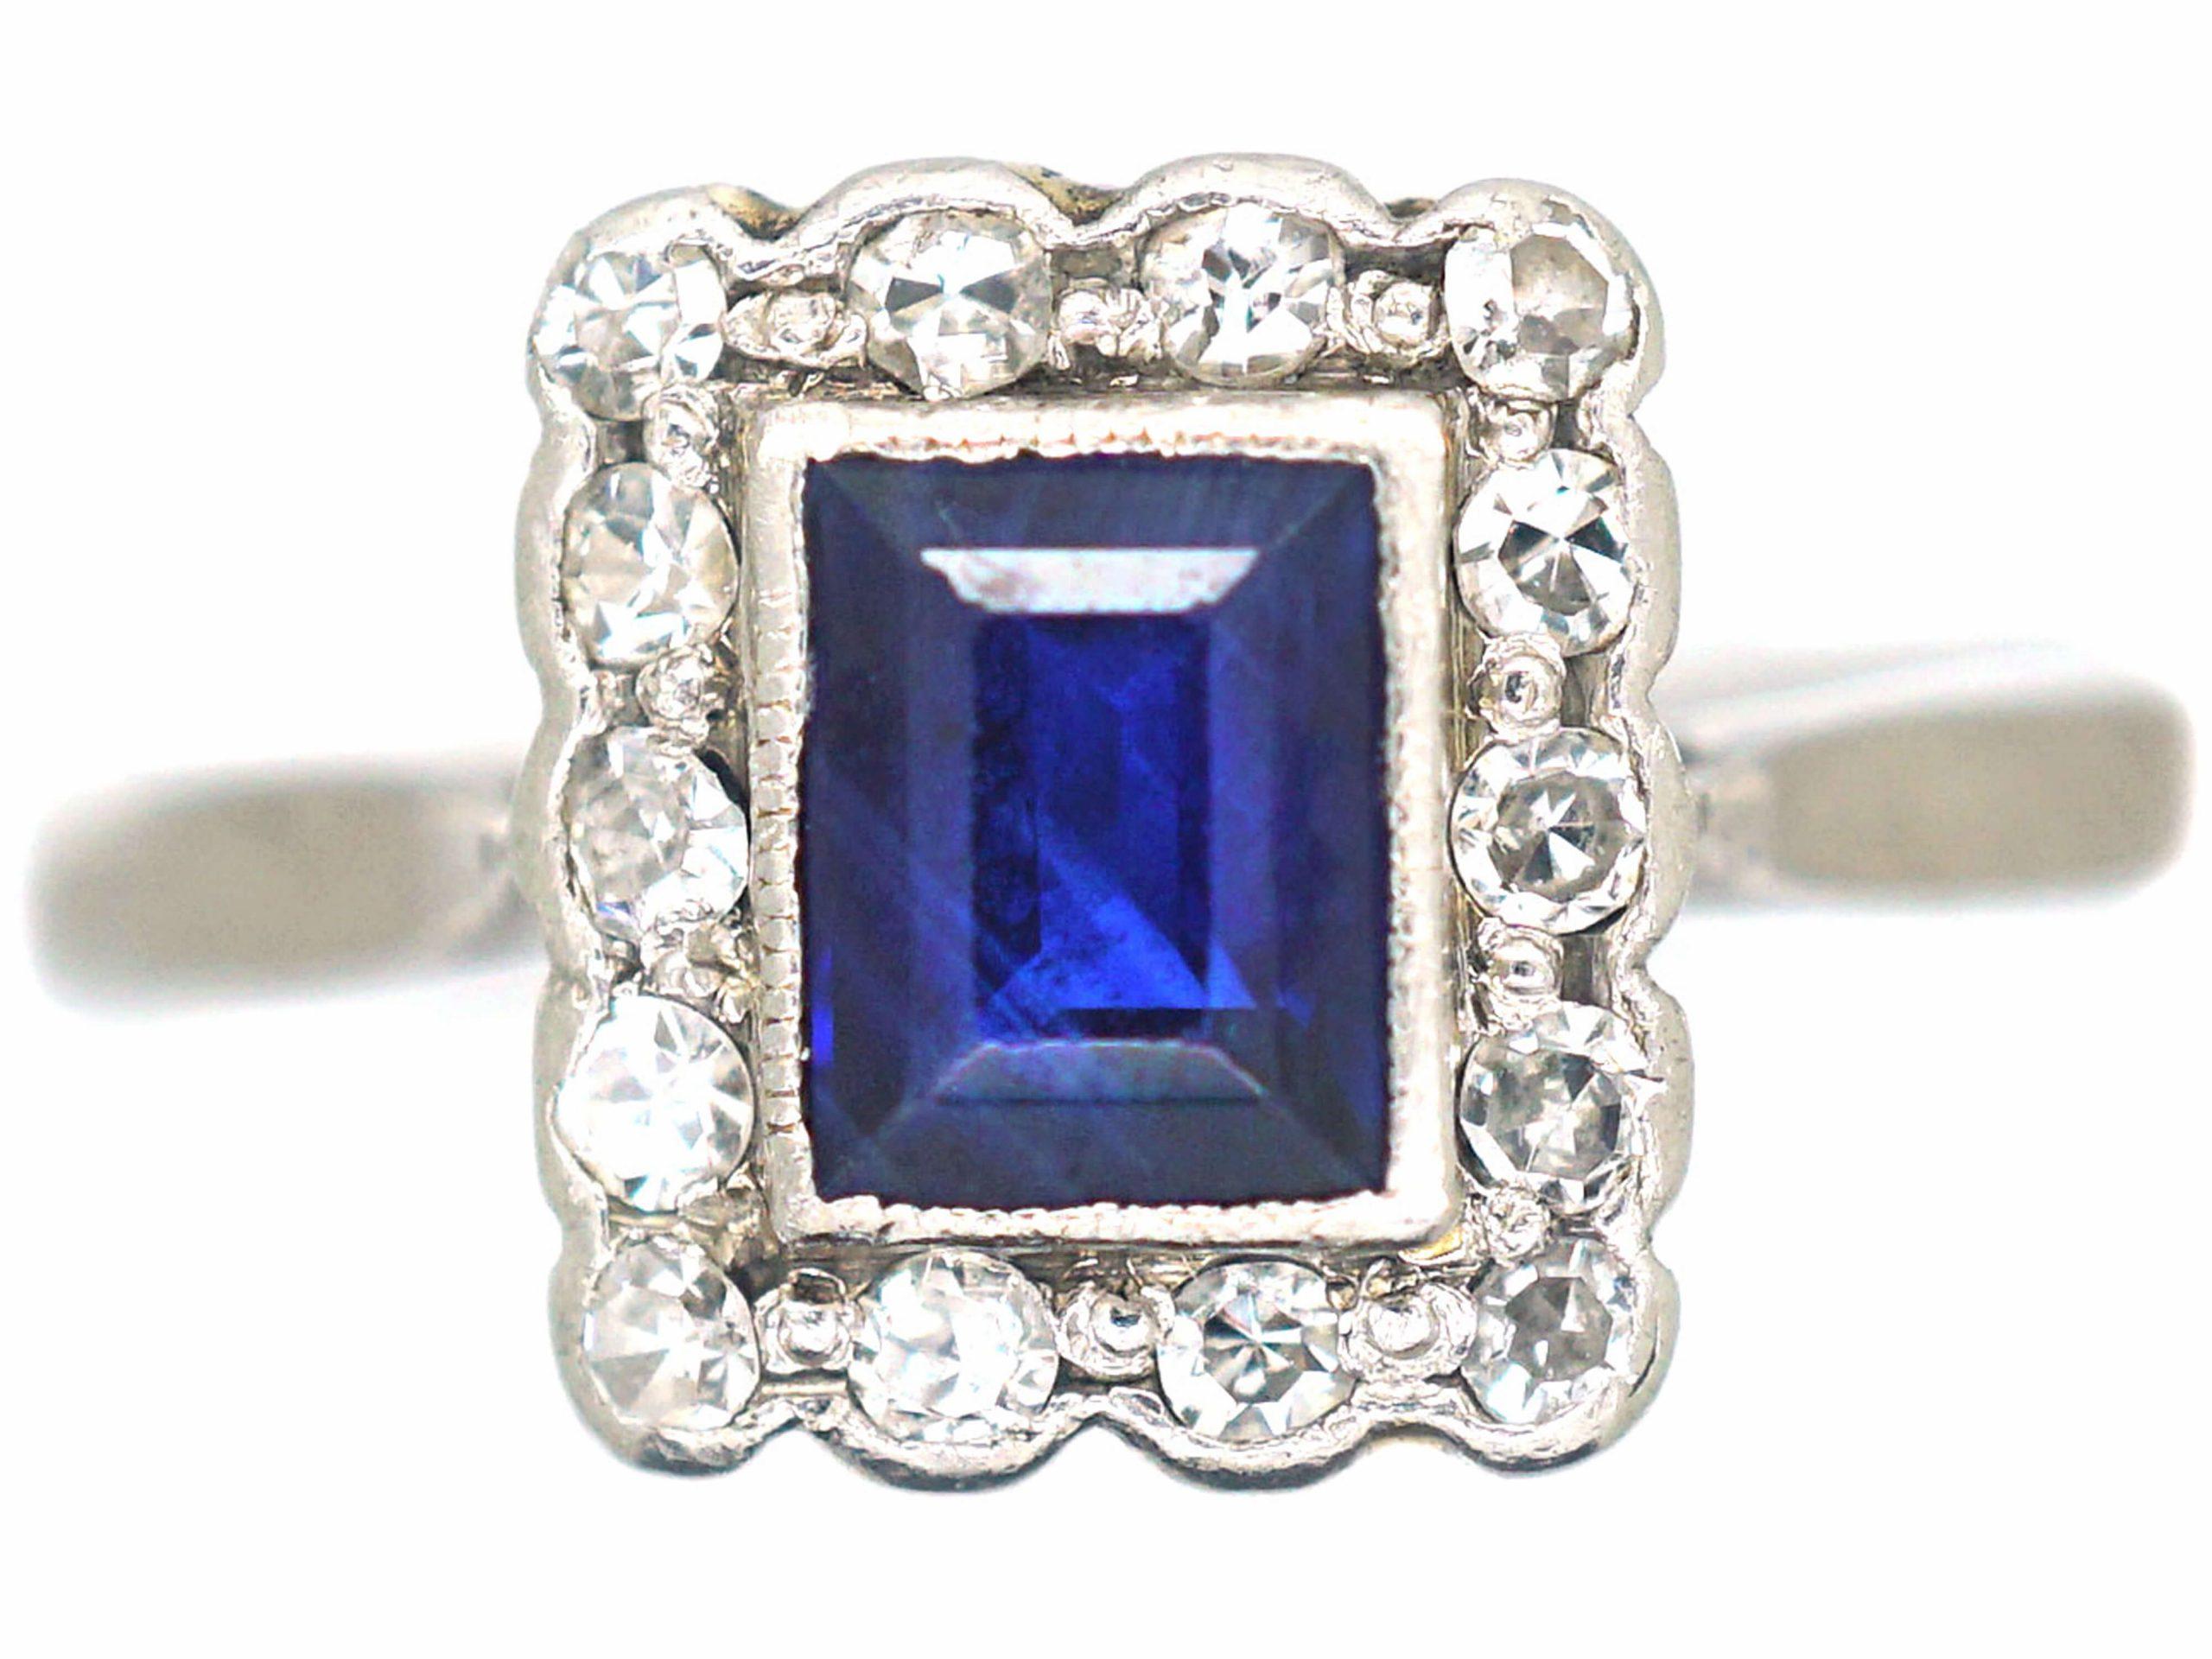 Art Deco 18ct White Gold & Platinum, Sapphire & Diamond Rectangular Ring